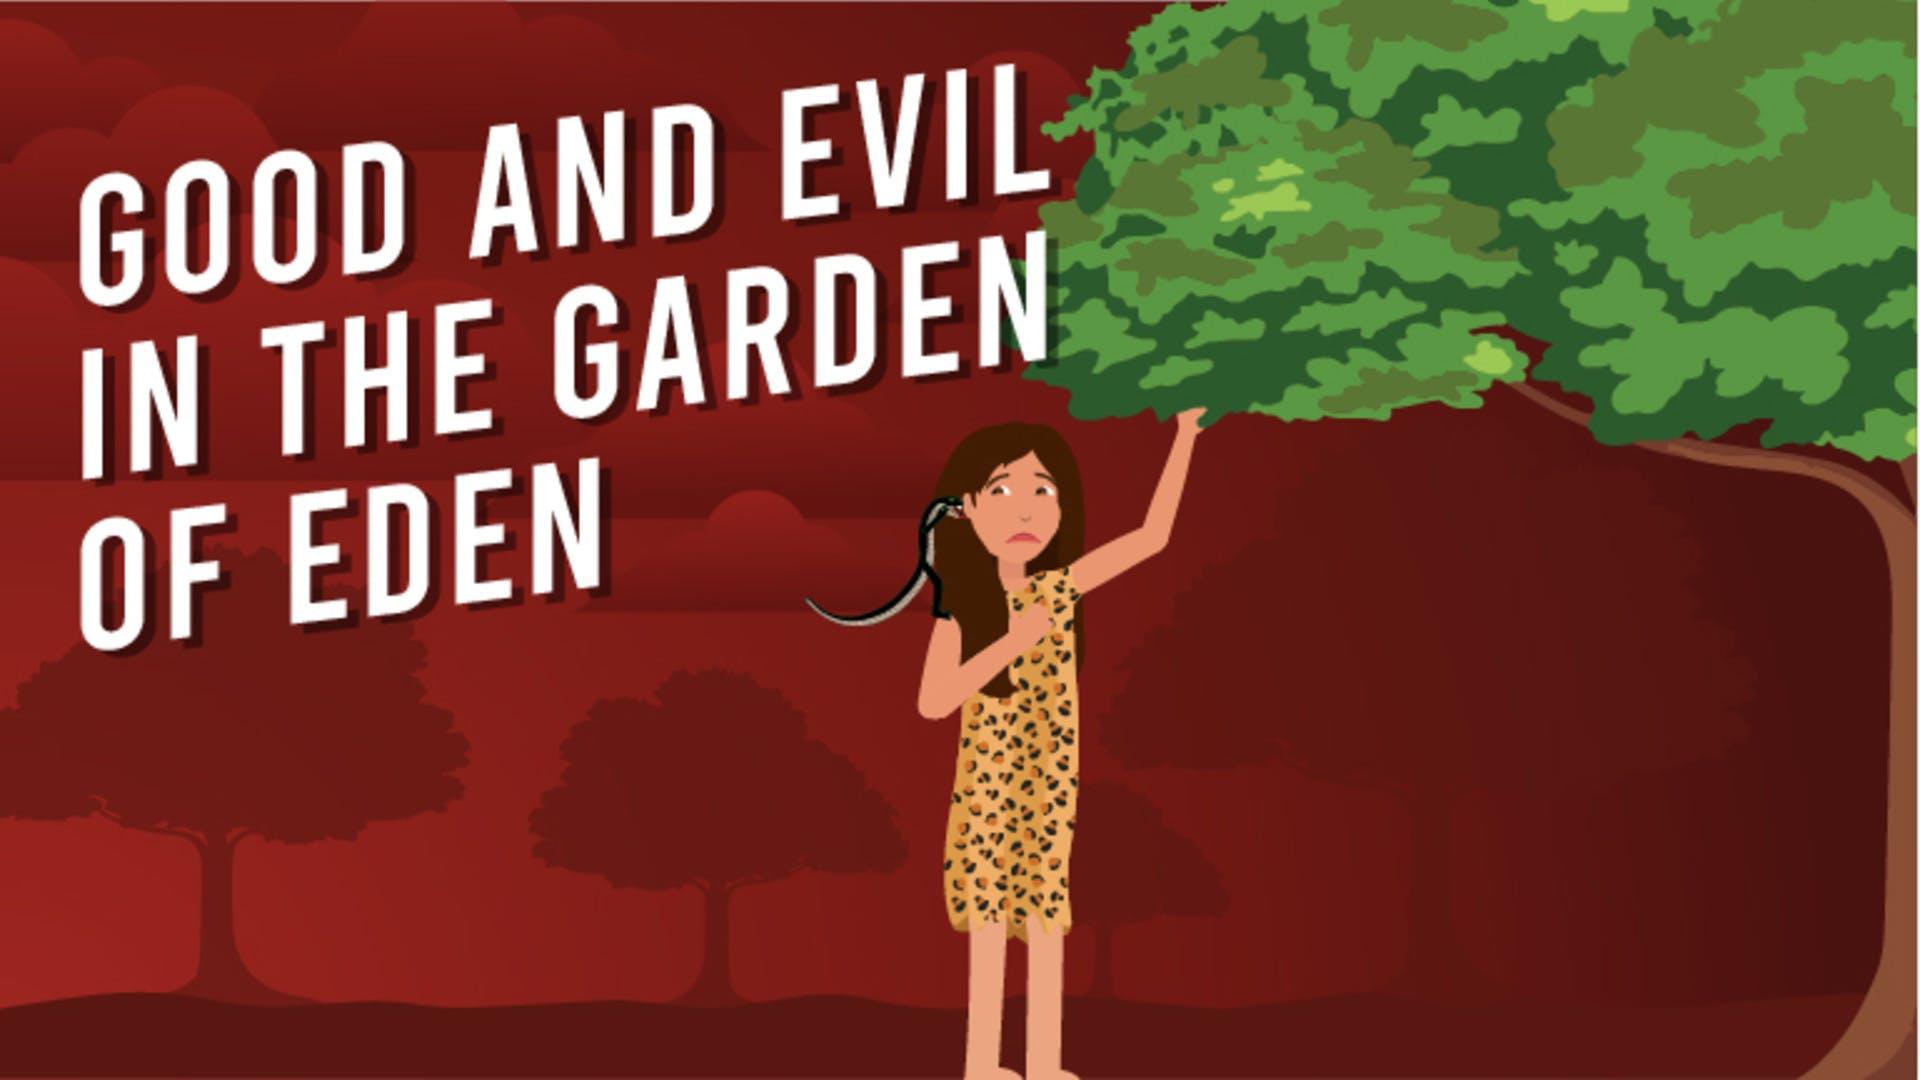 Forbidden Tree Knowledge Good Evil Symbolism